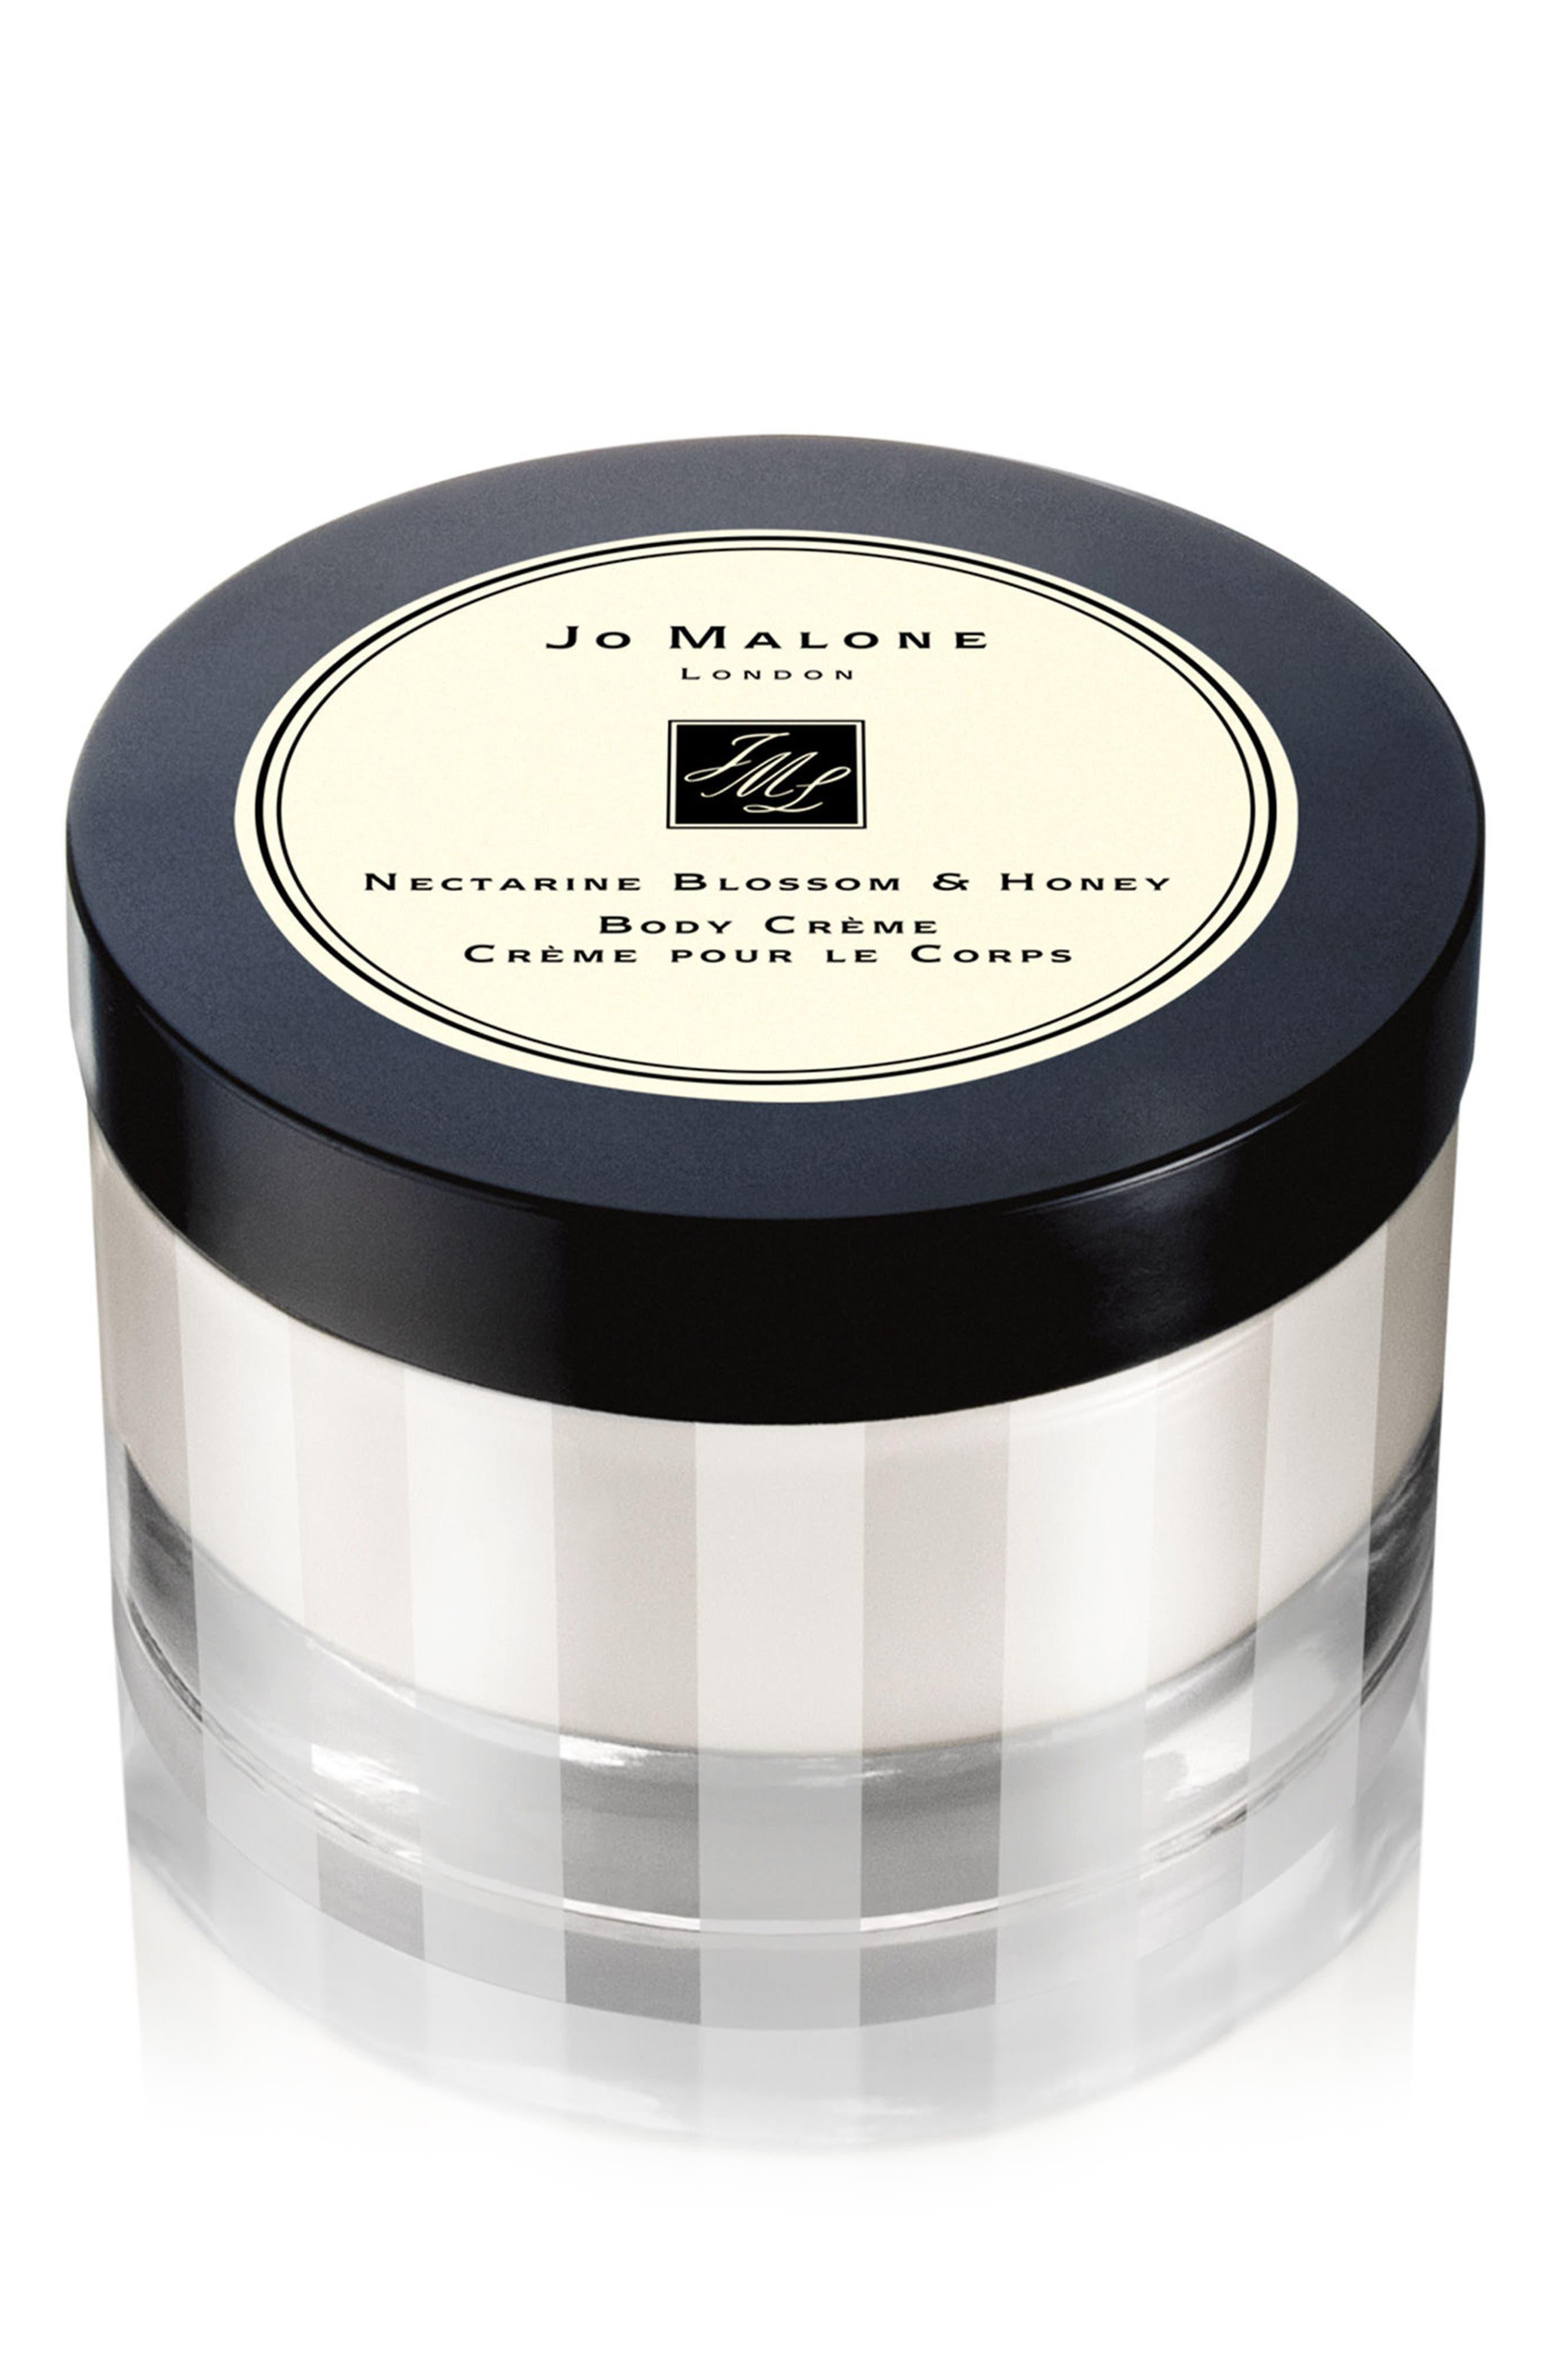 Jo Malone London™ Nectarine Blossom & Honey Body Crème